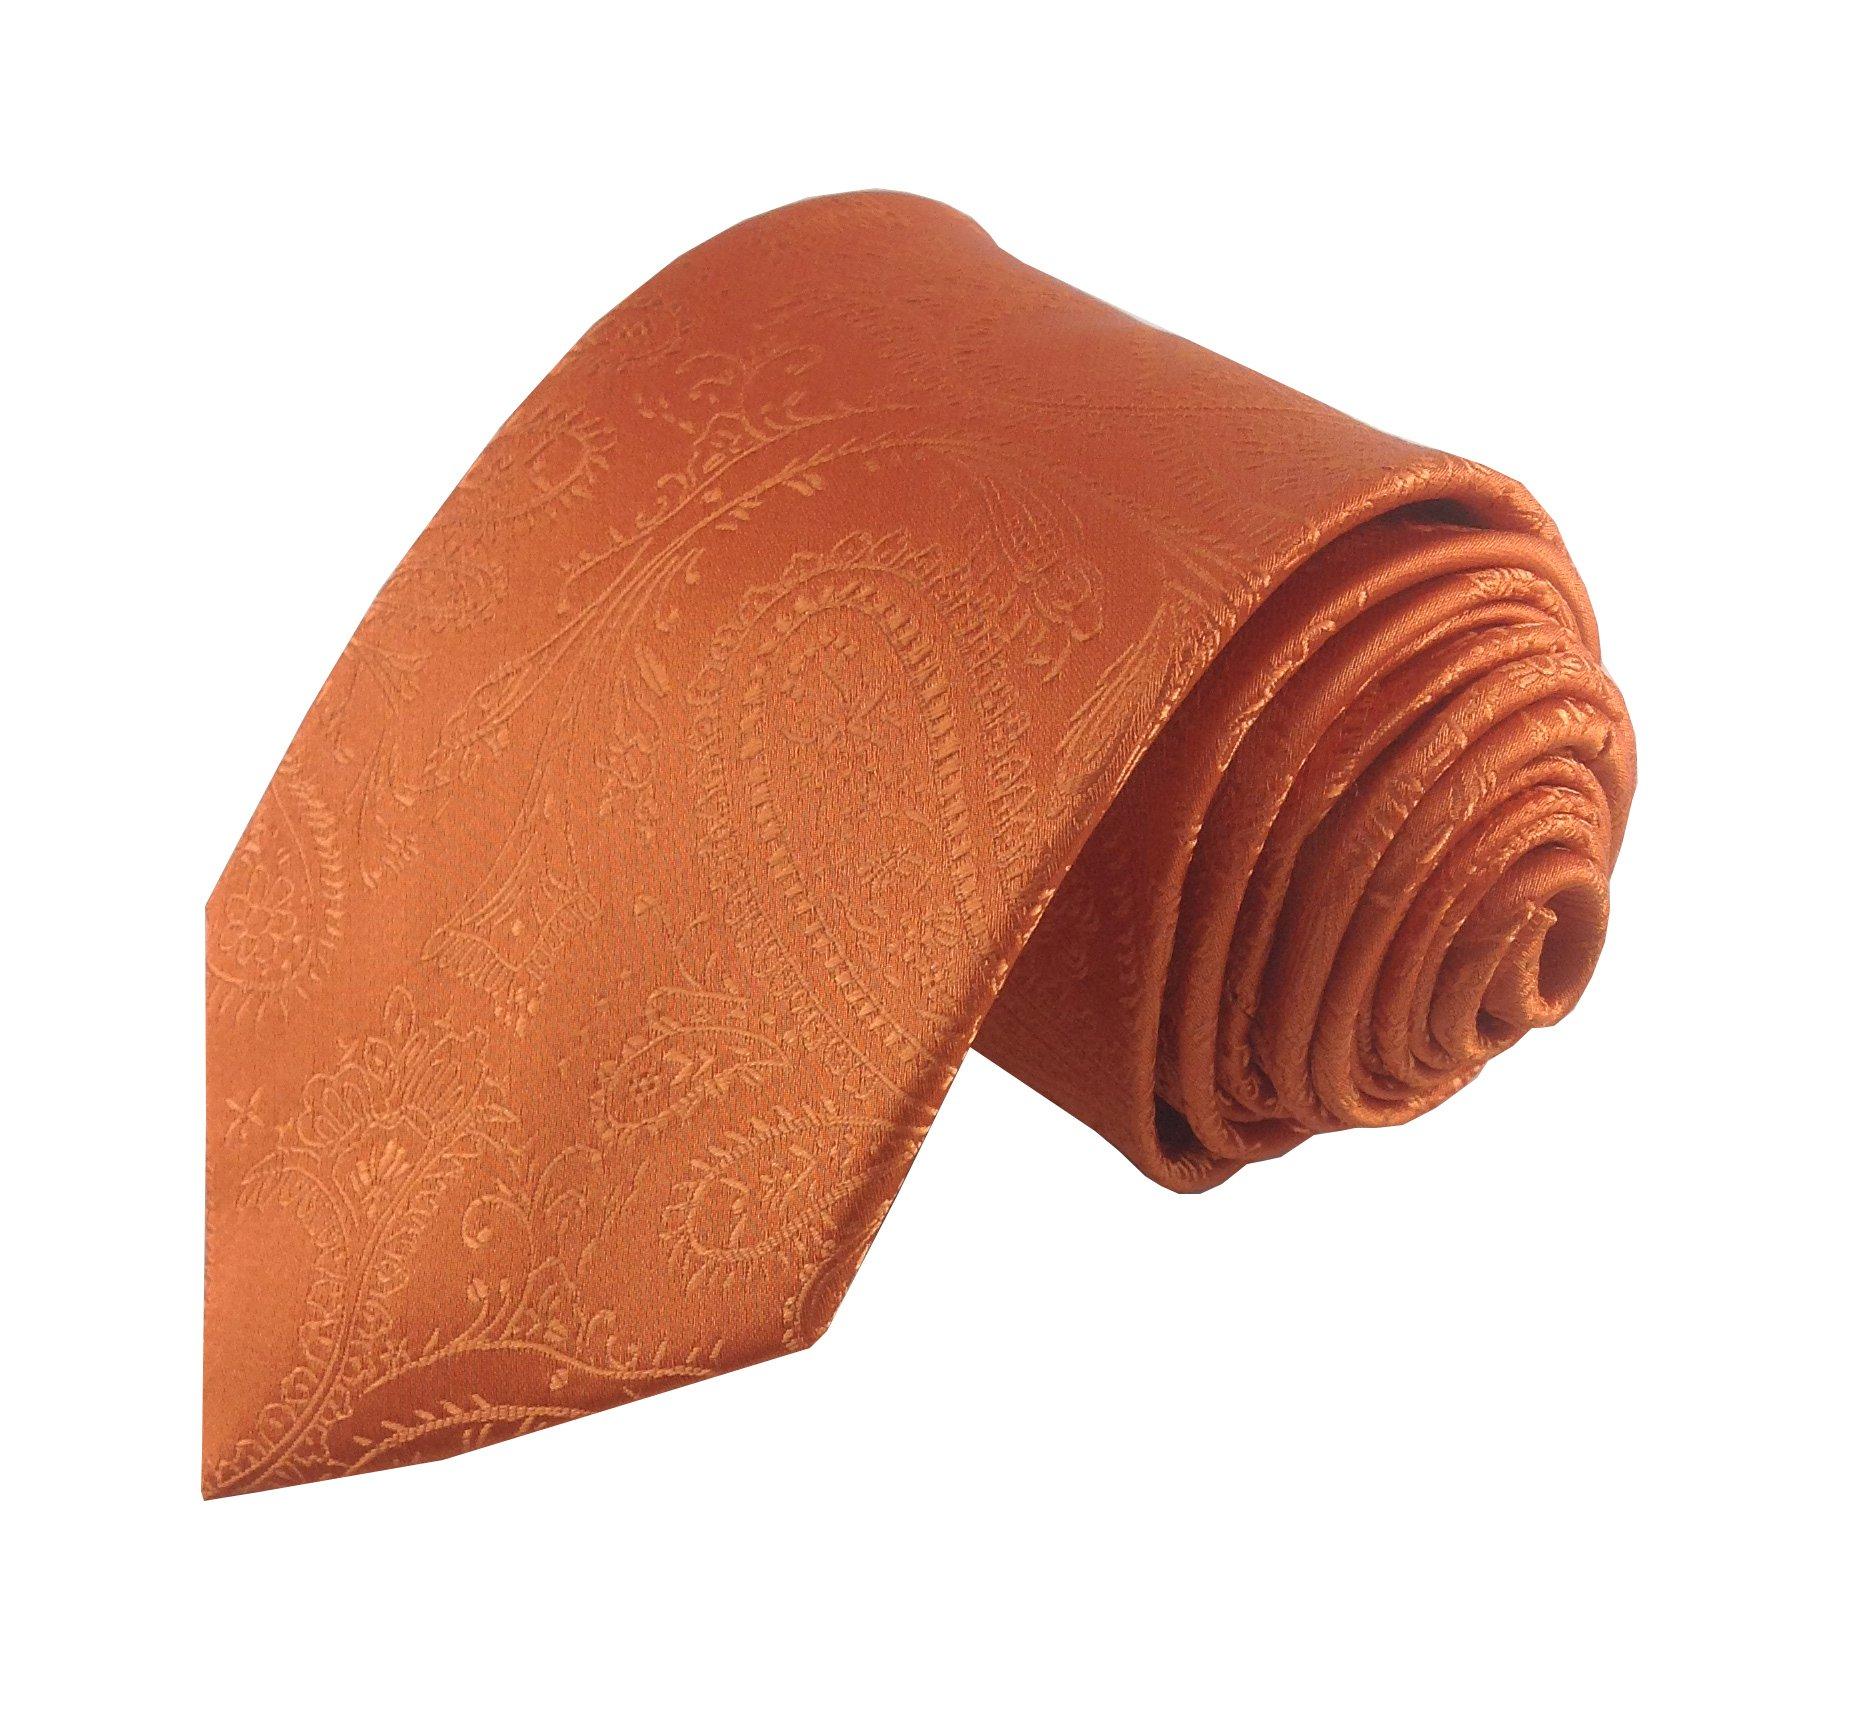 Bulk Wedding Solid Colored Paisley Patterned Necktie Package for Groomsmen (8-Pack, Orange)